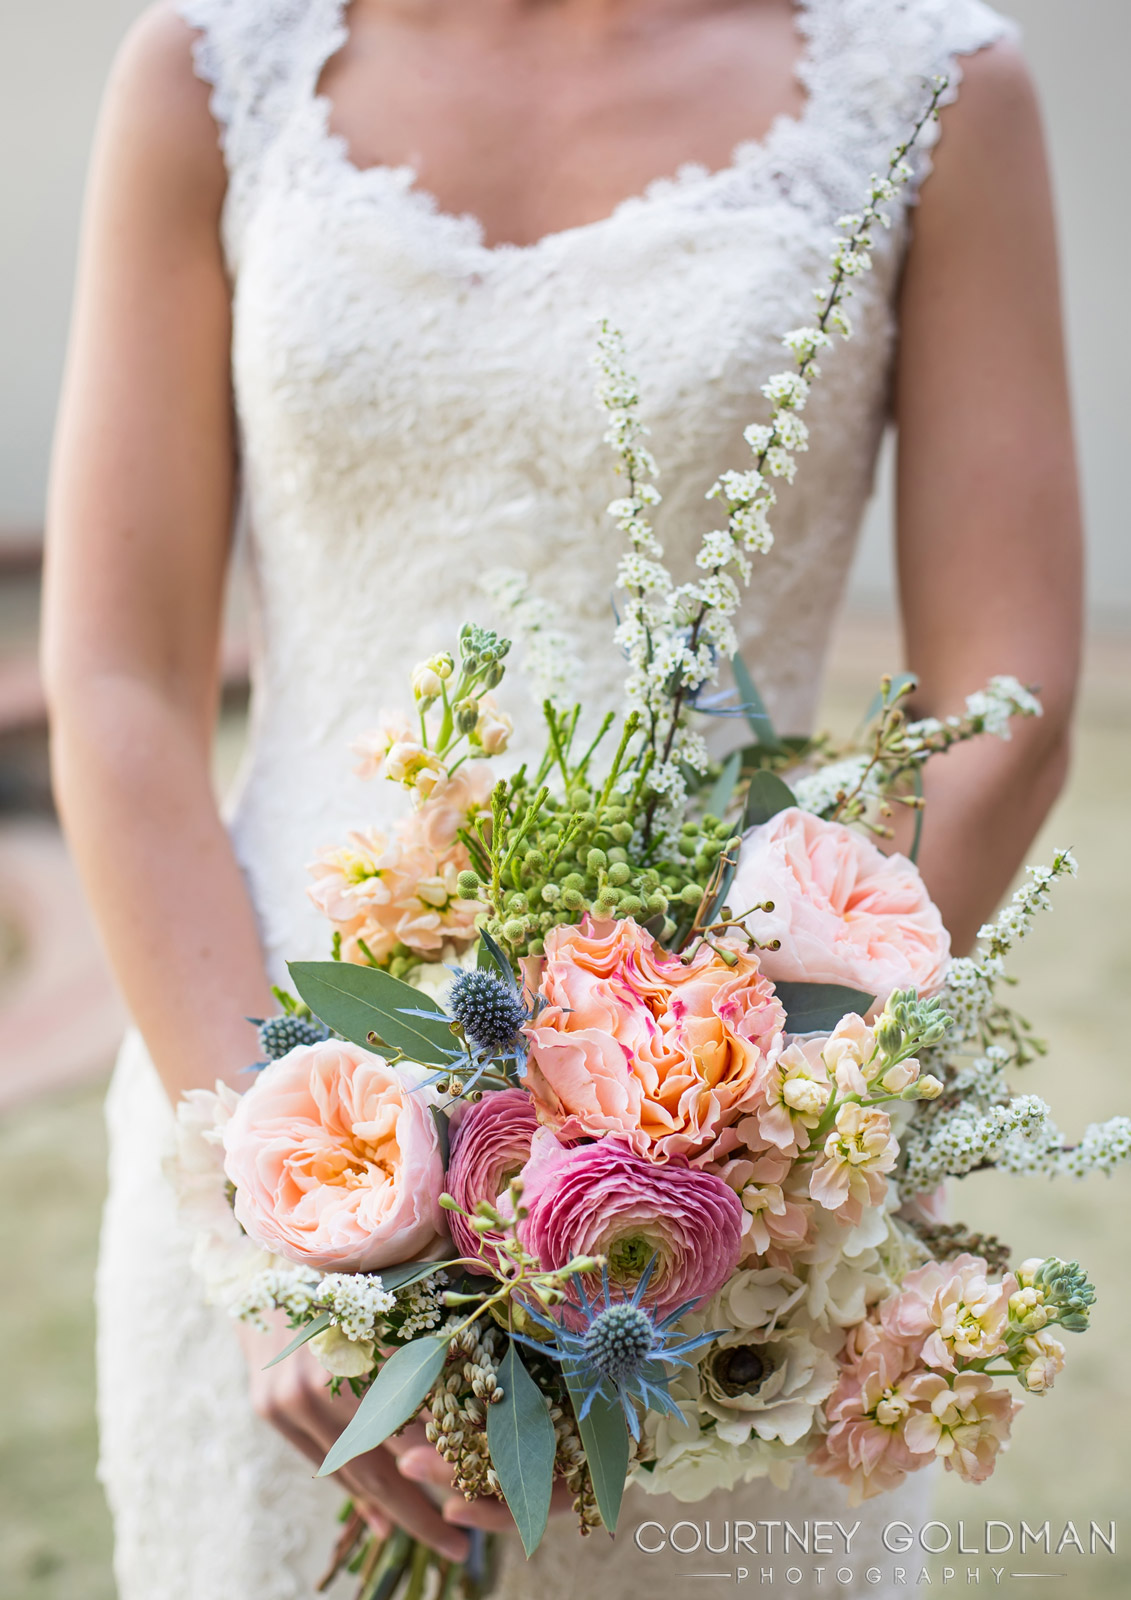 Atlanta-Wedding-Photography-by-Courtney-Goldman-49.jpg